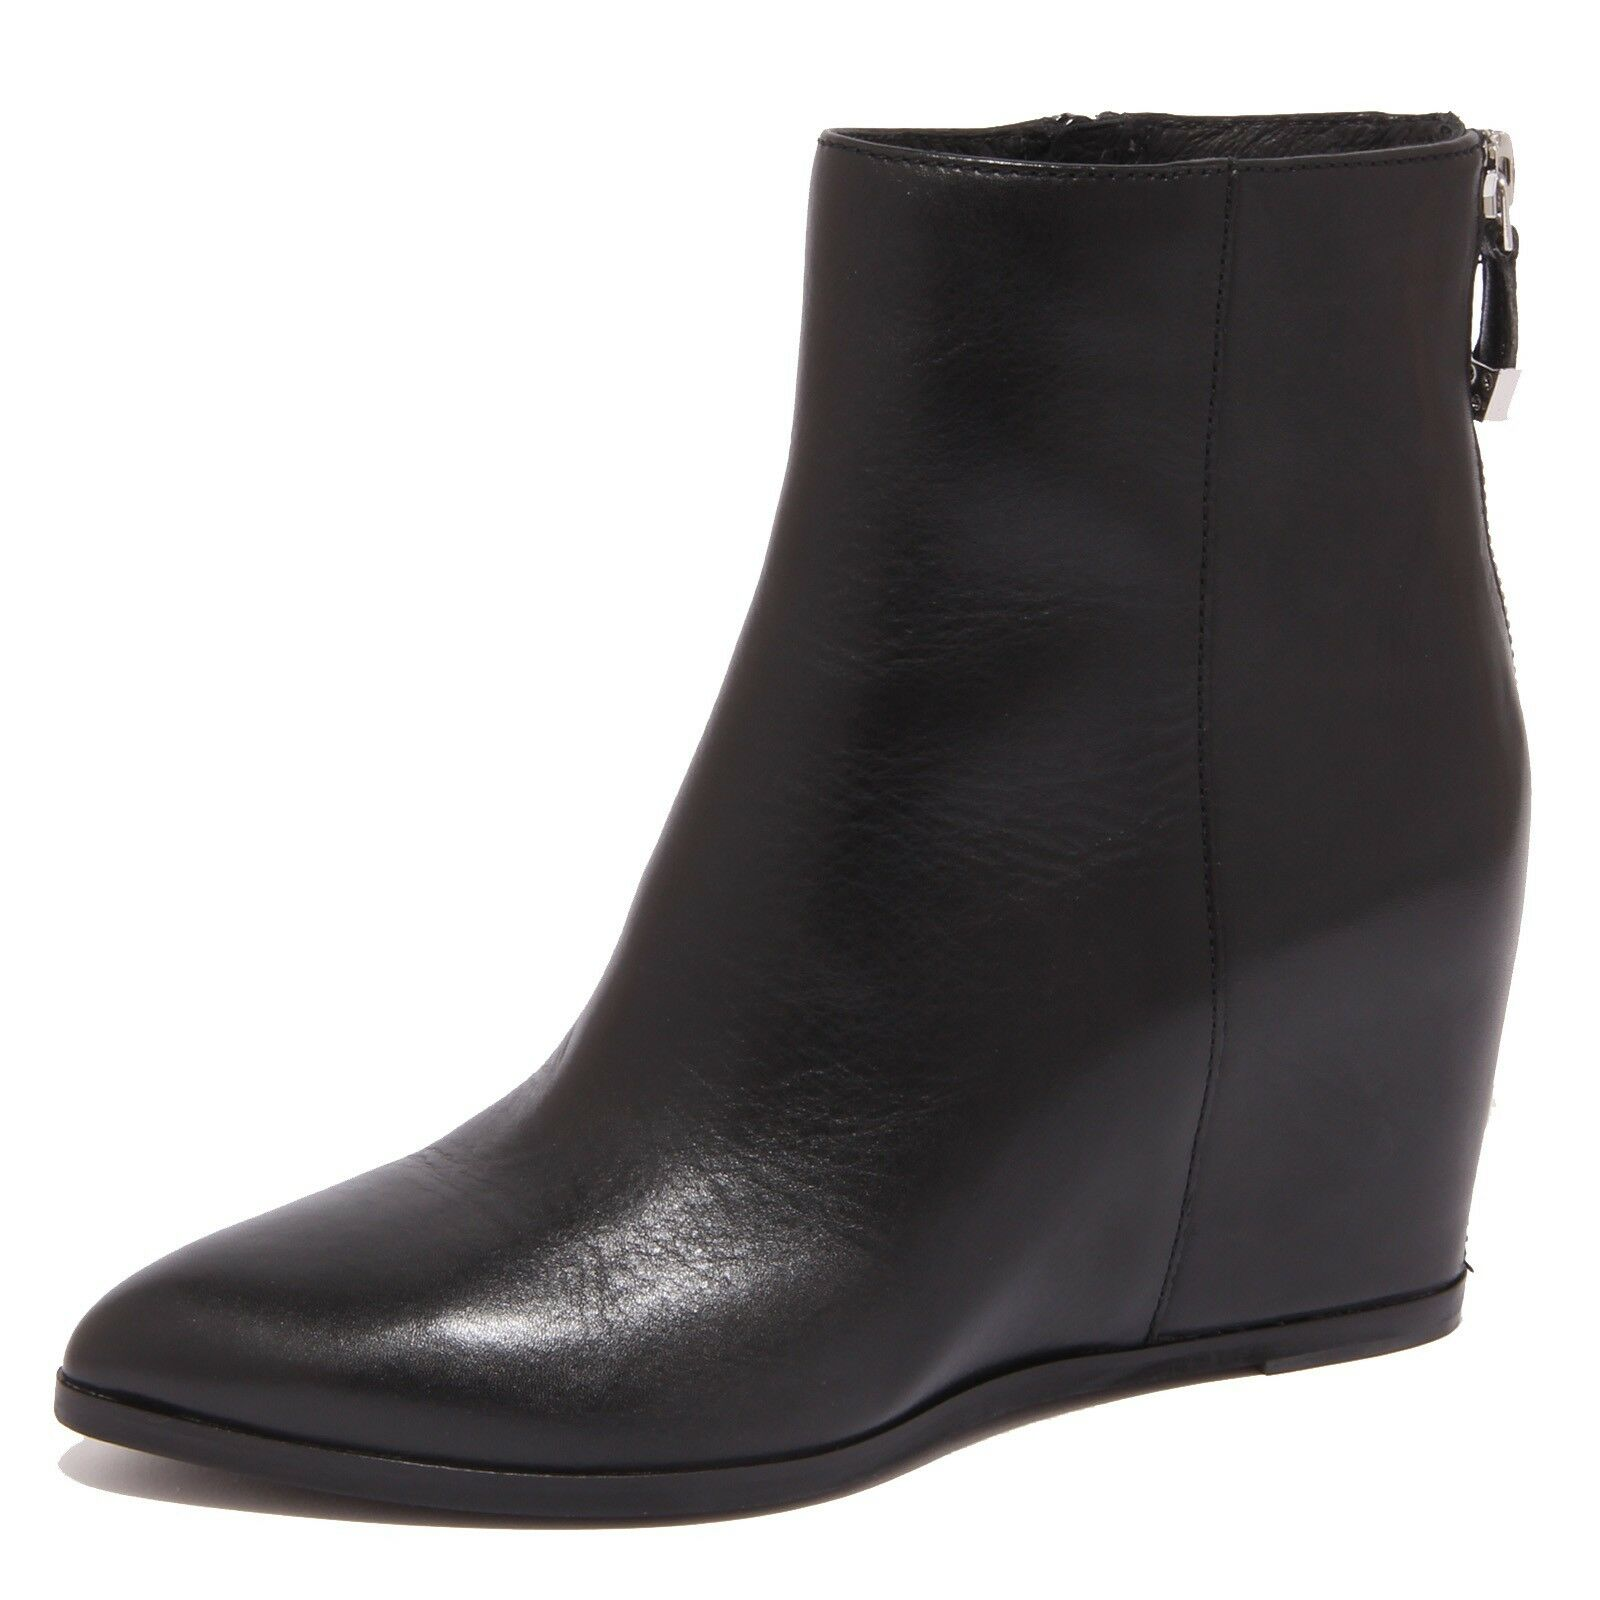 8746p what for black stivaletto tronchetto women boot woman